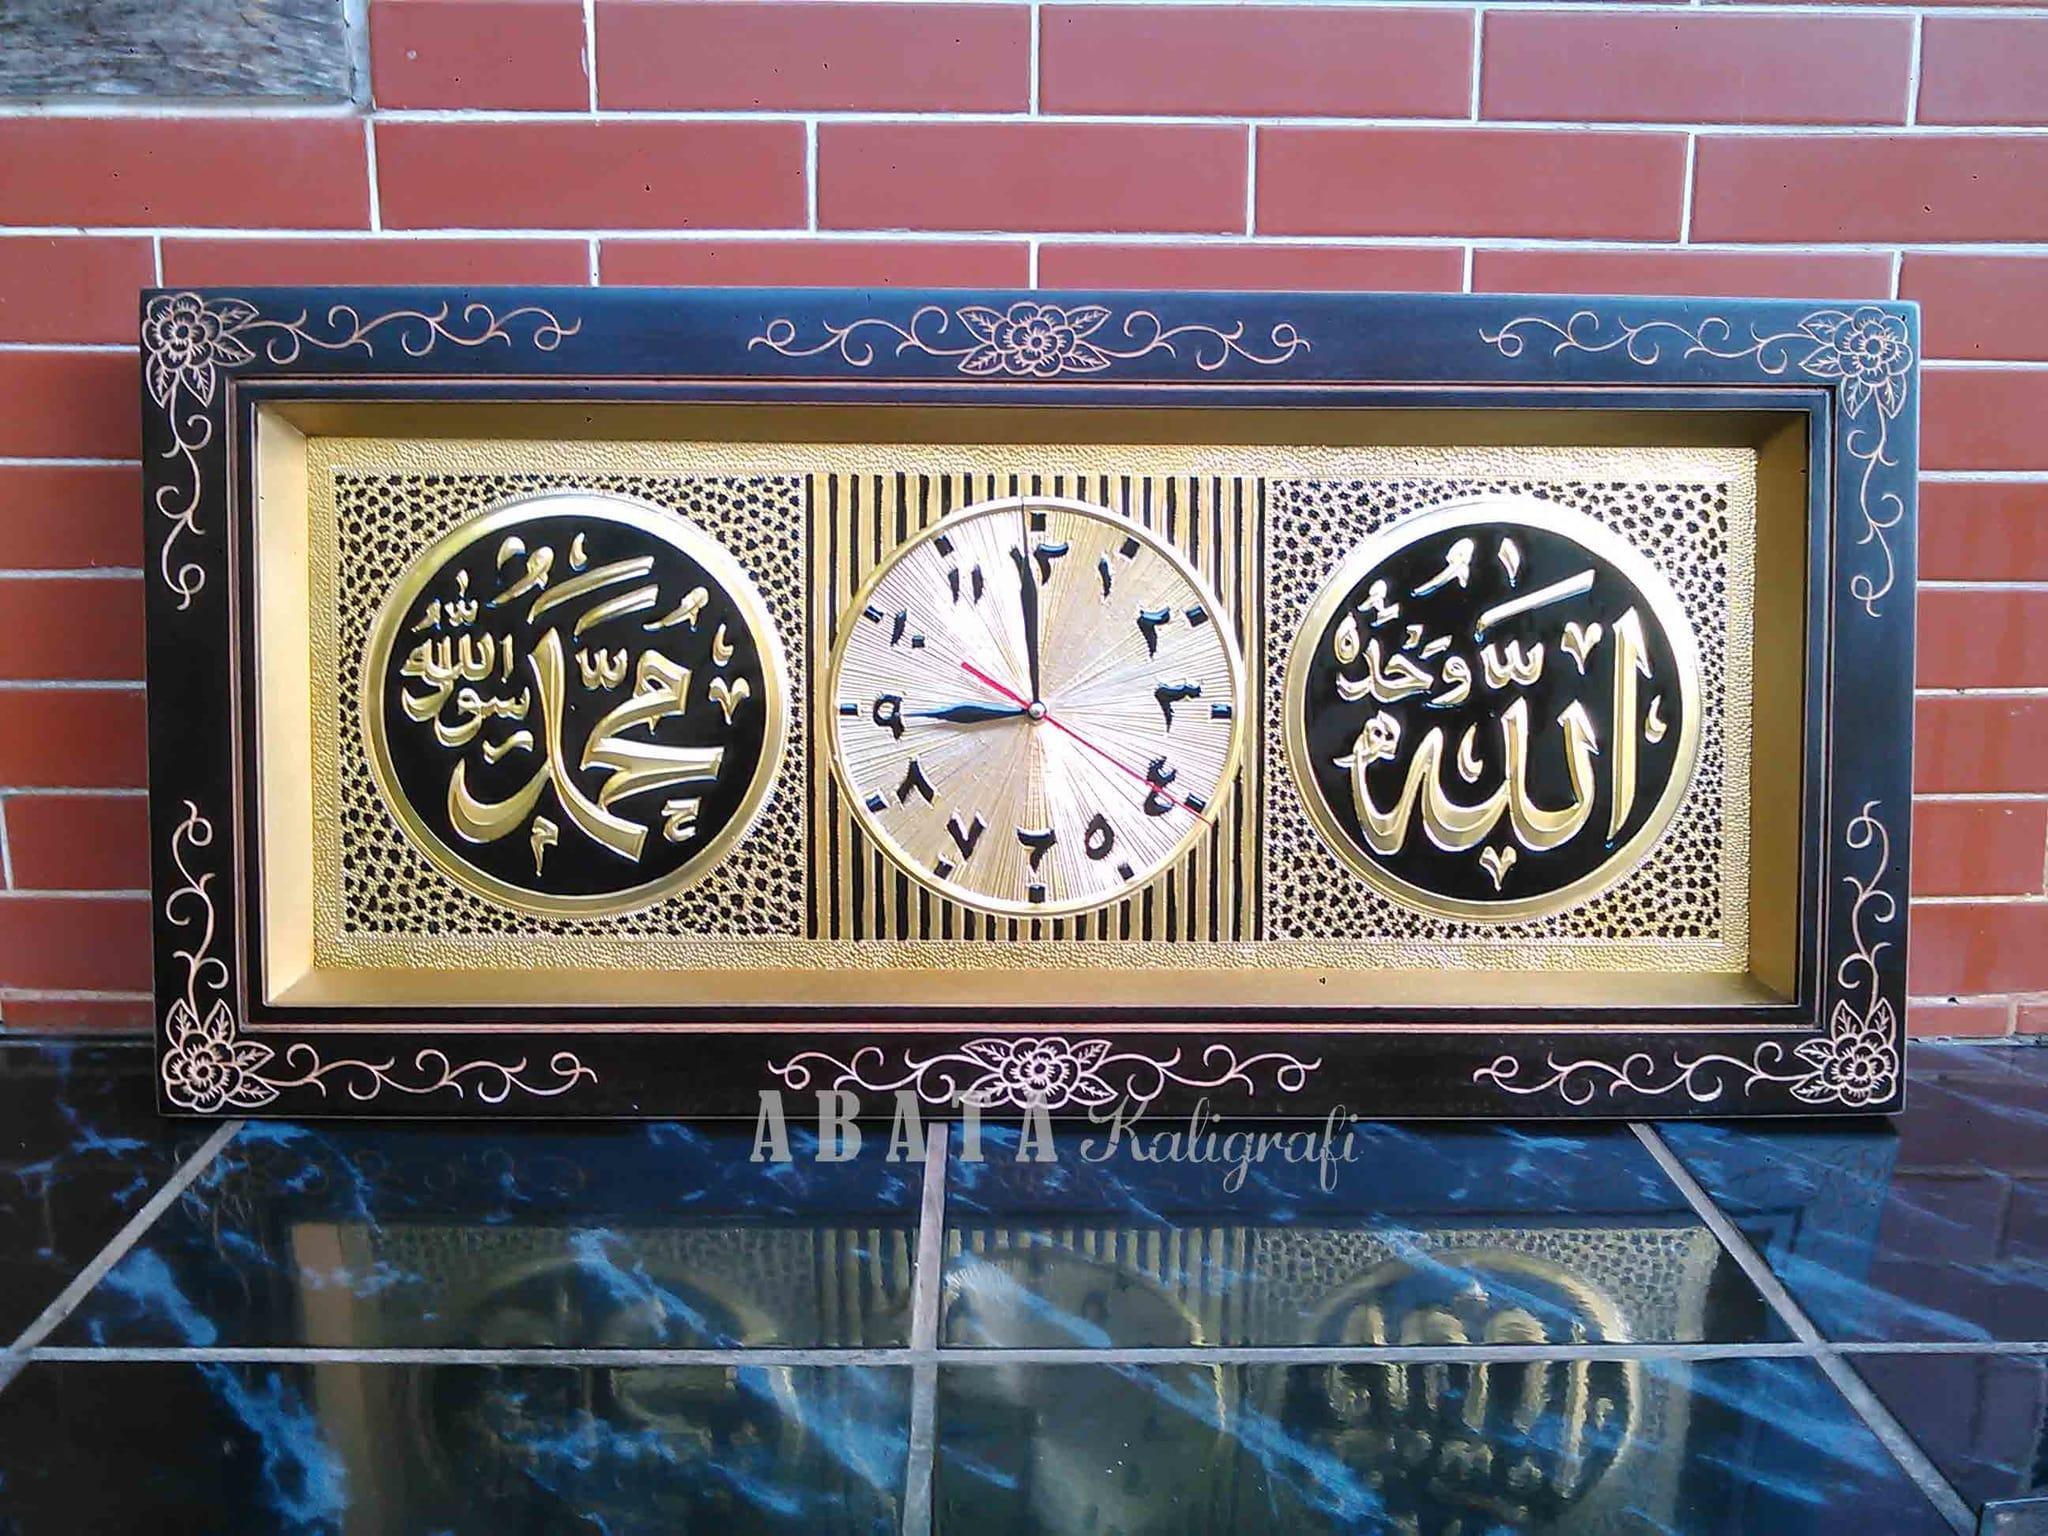 Ogana Clock Jam Dinding Gambar Kaligrafi 3d - Daftar Harga Terbaru ... 82da54cb8d